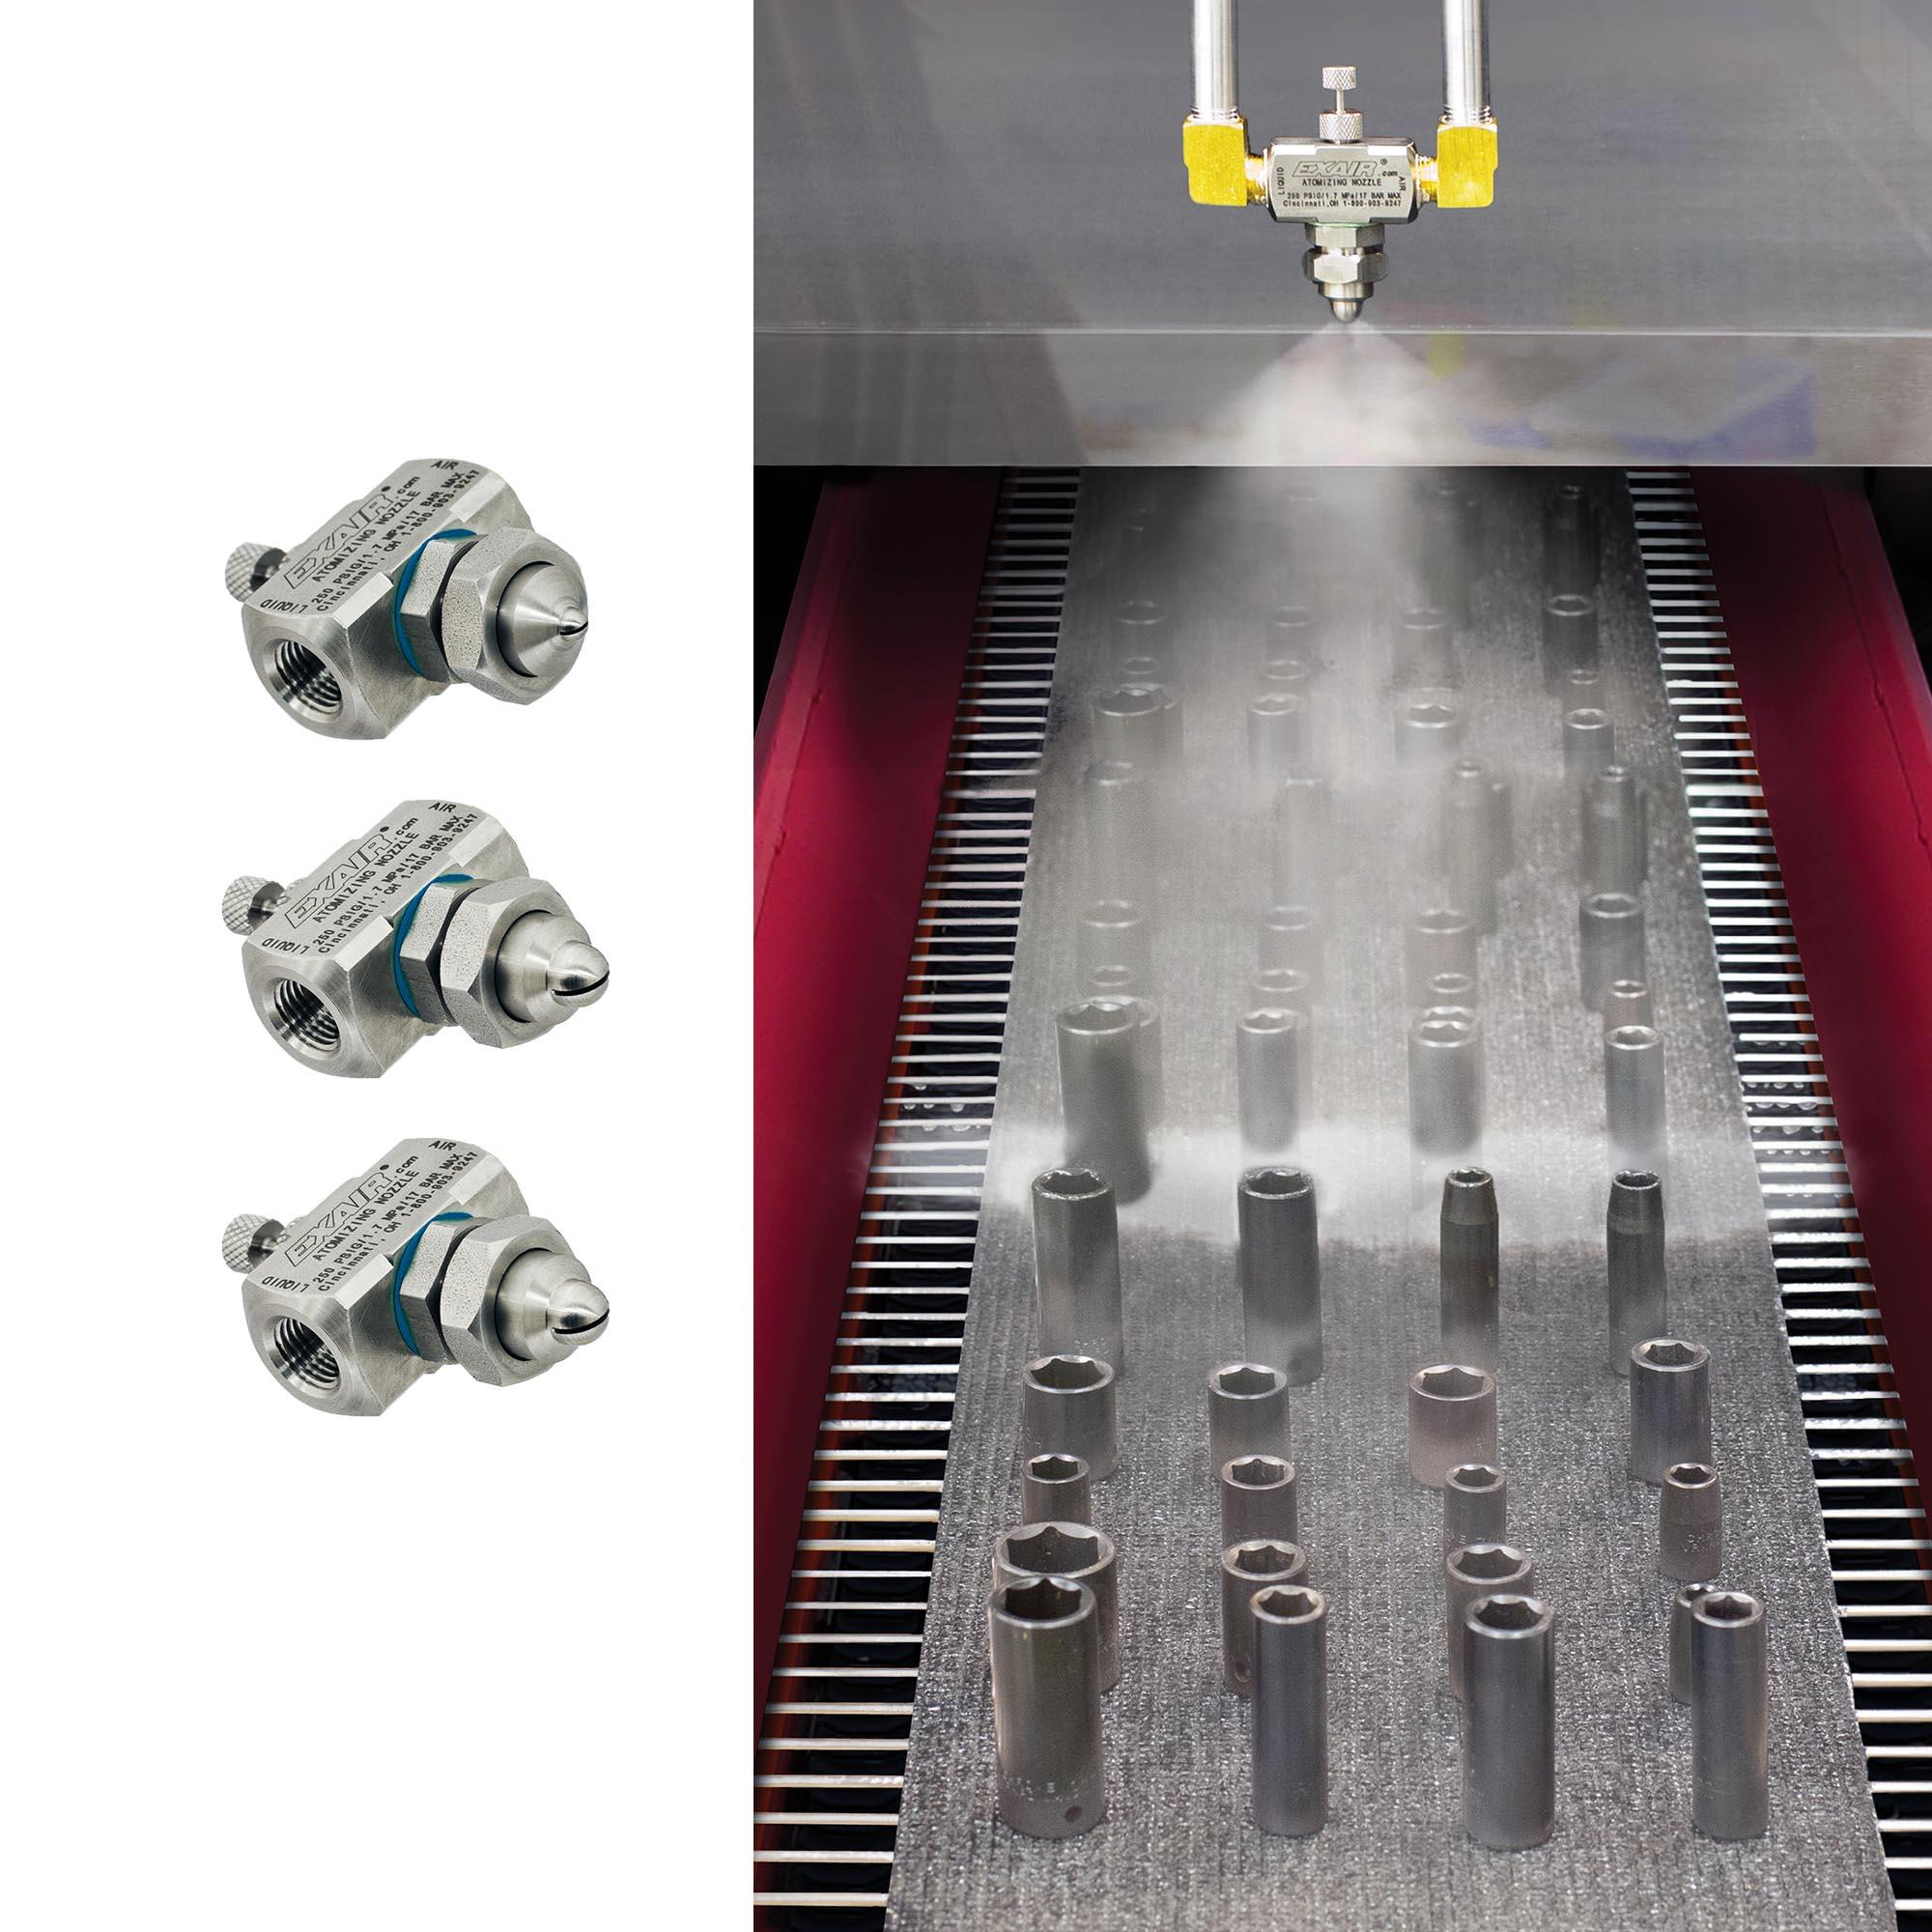 Siphon Fed Liquid Atomizing Nozzles